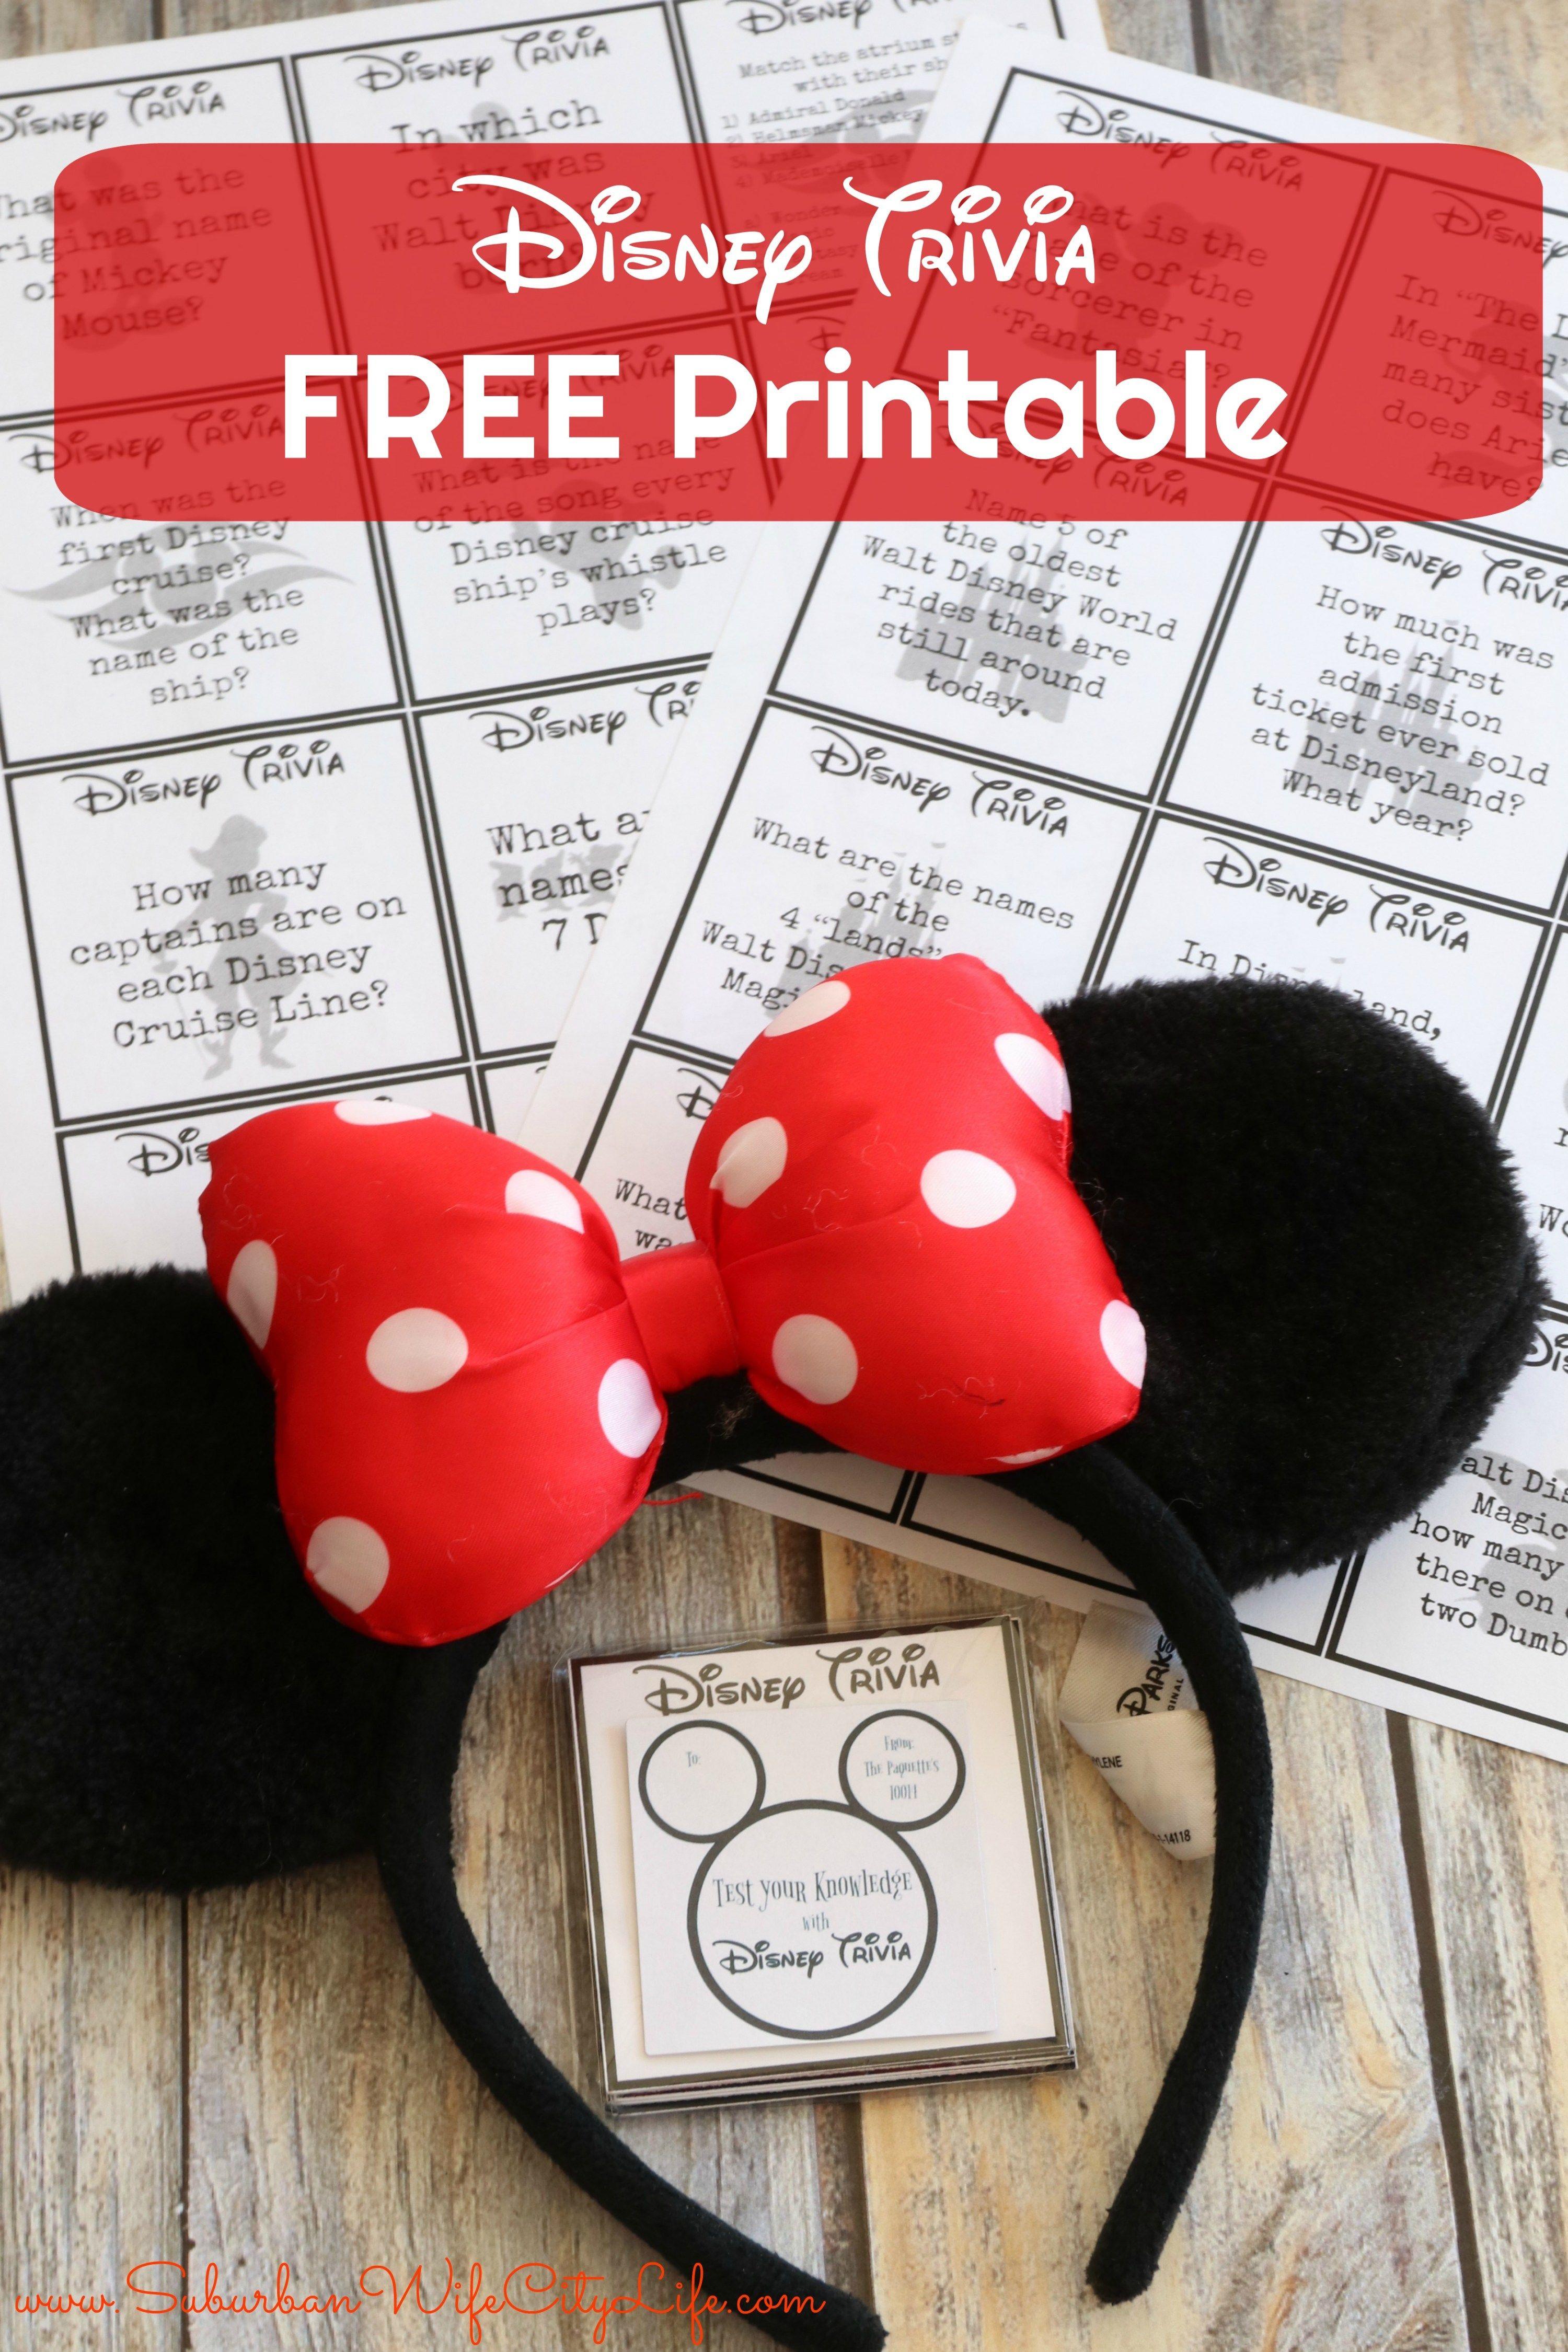 Disney Trivia Free Printable Disney facts, Disney